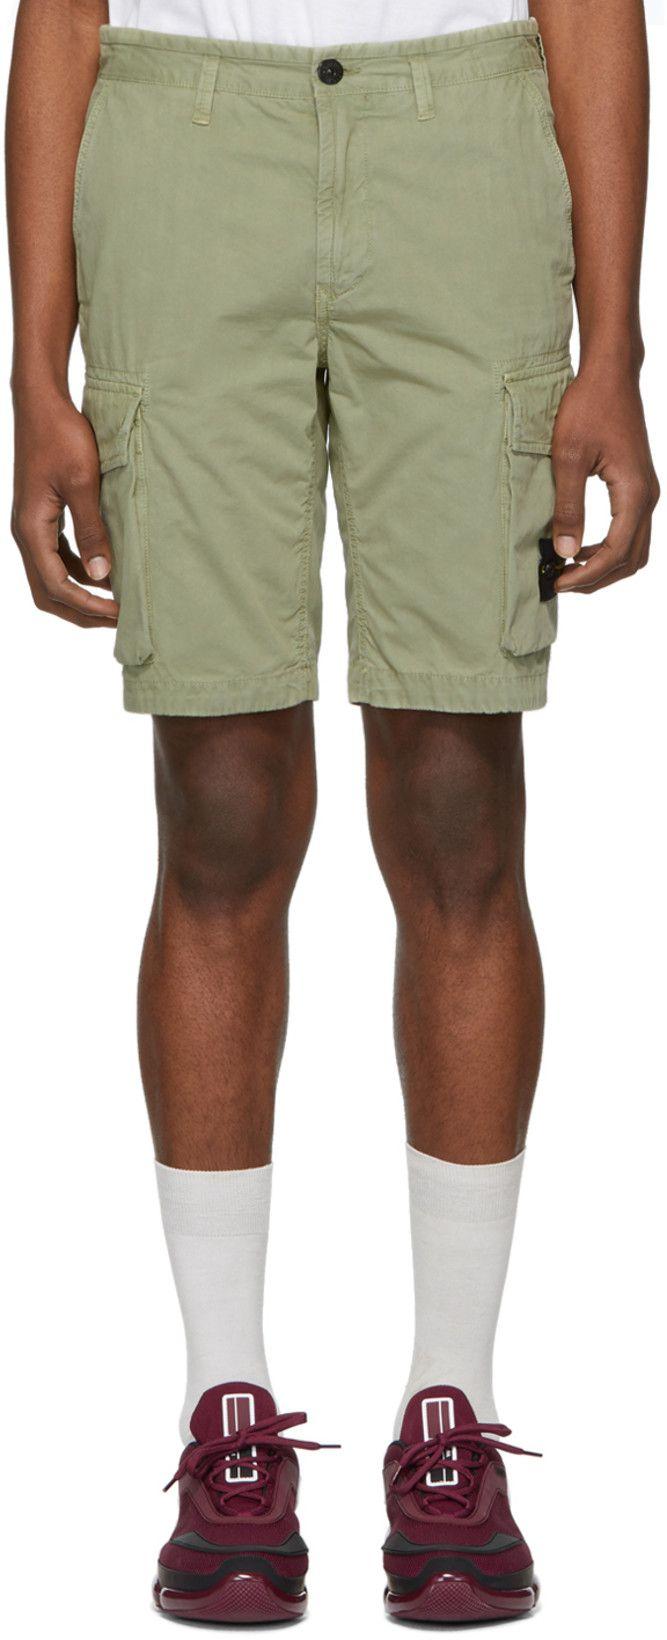 Stone Island Green Bermuda Shorts Bermuda Shorts Stone Island Cargo Shorts